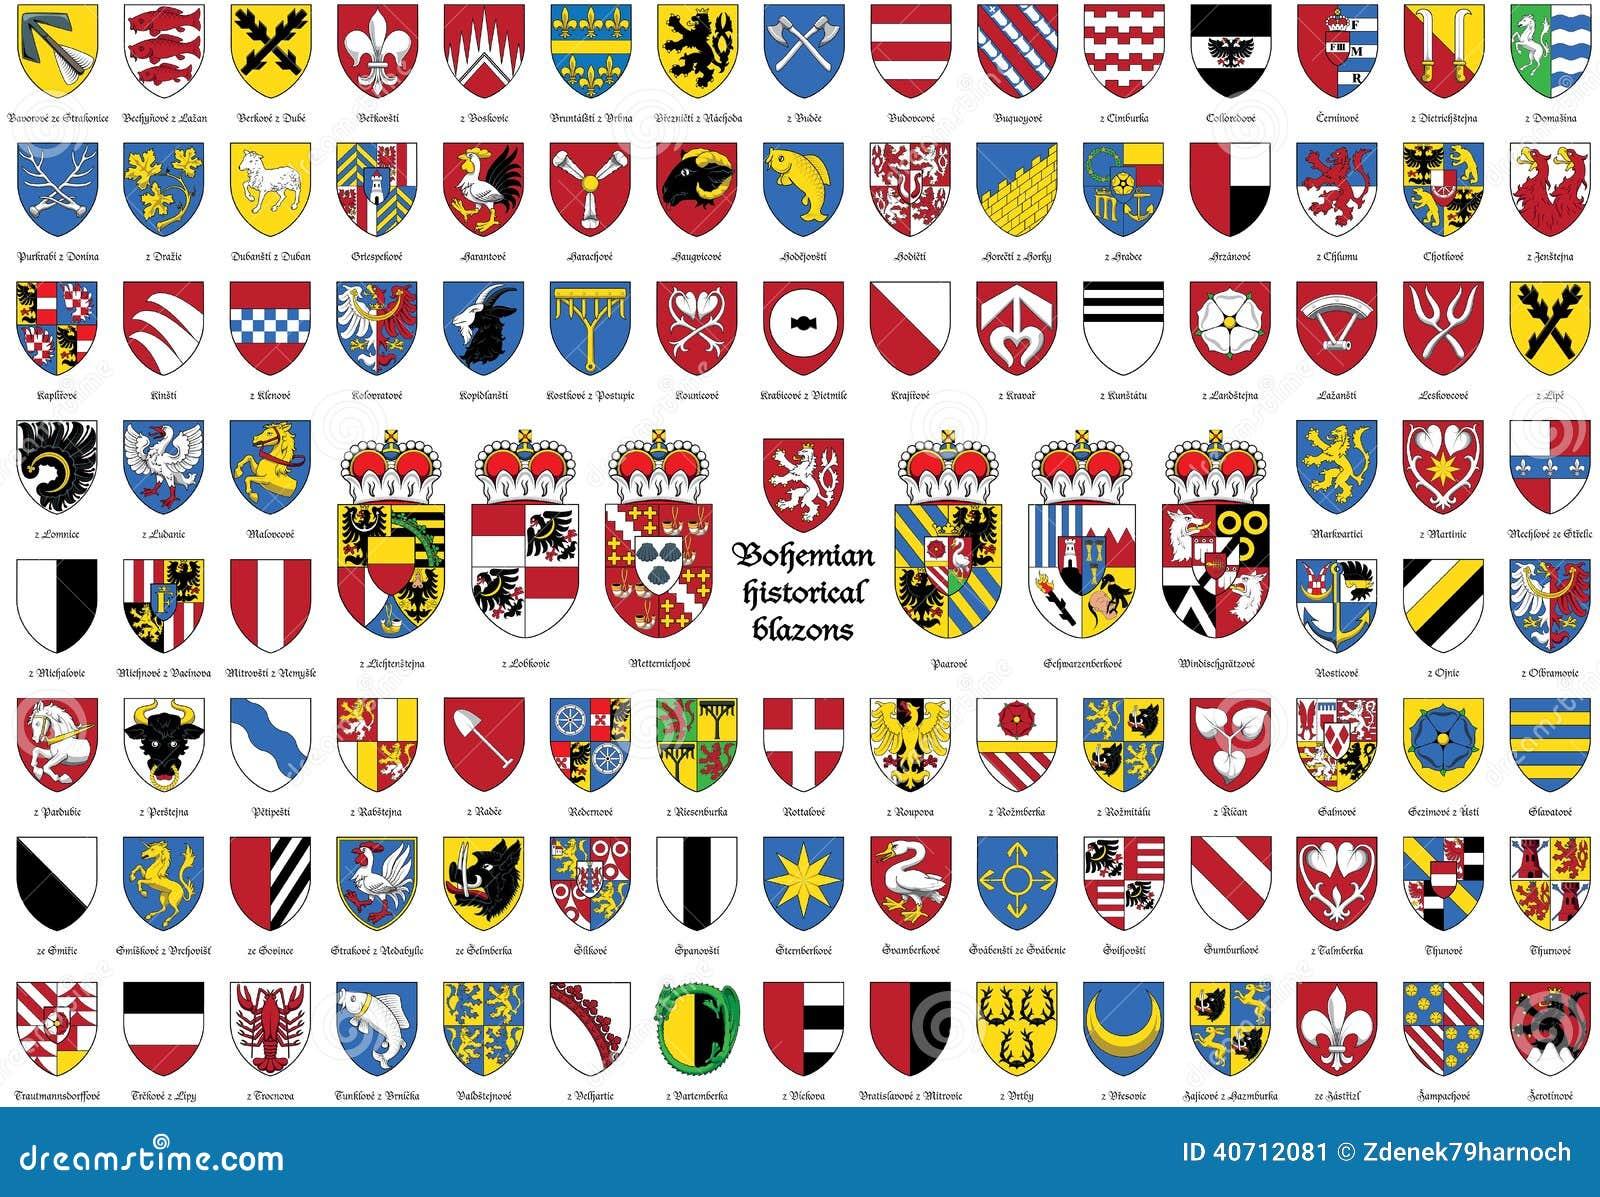 Heraldry and the coat of arms buycottarizona